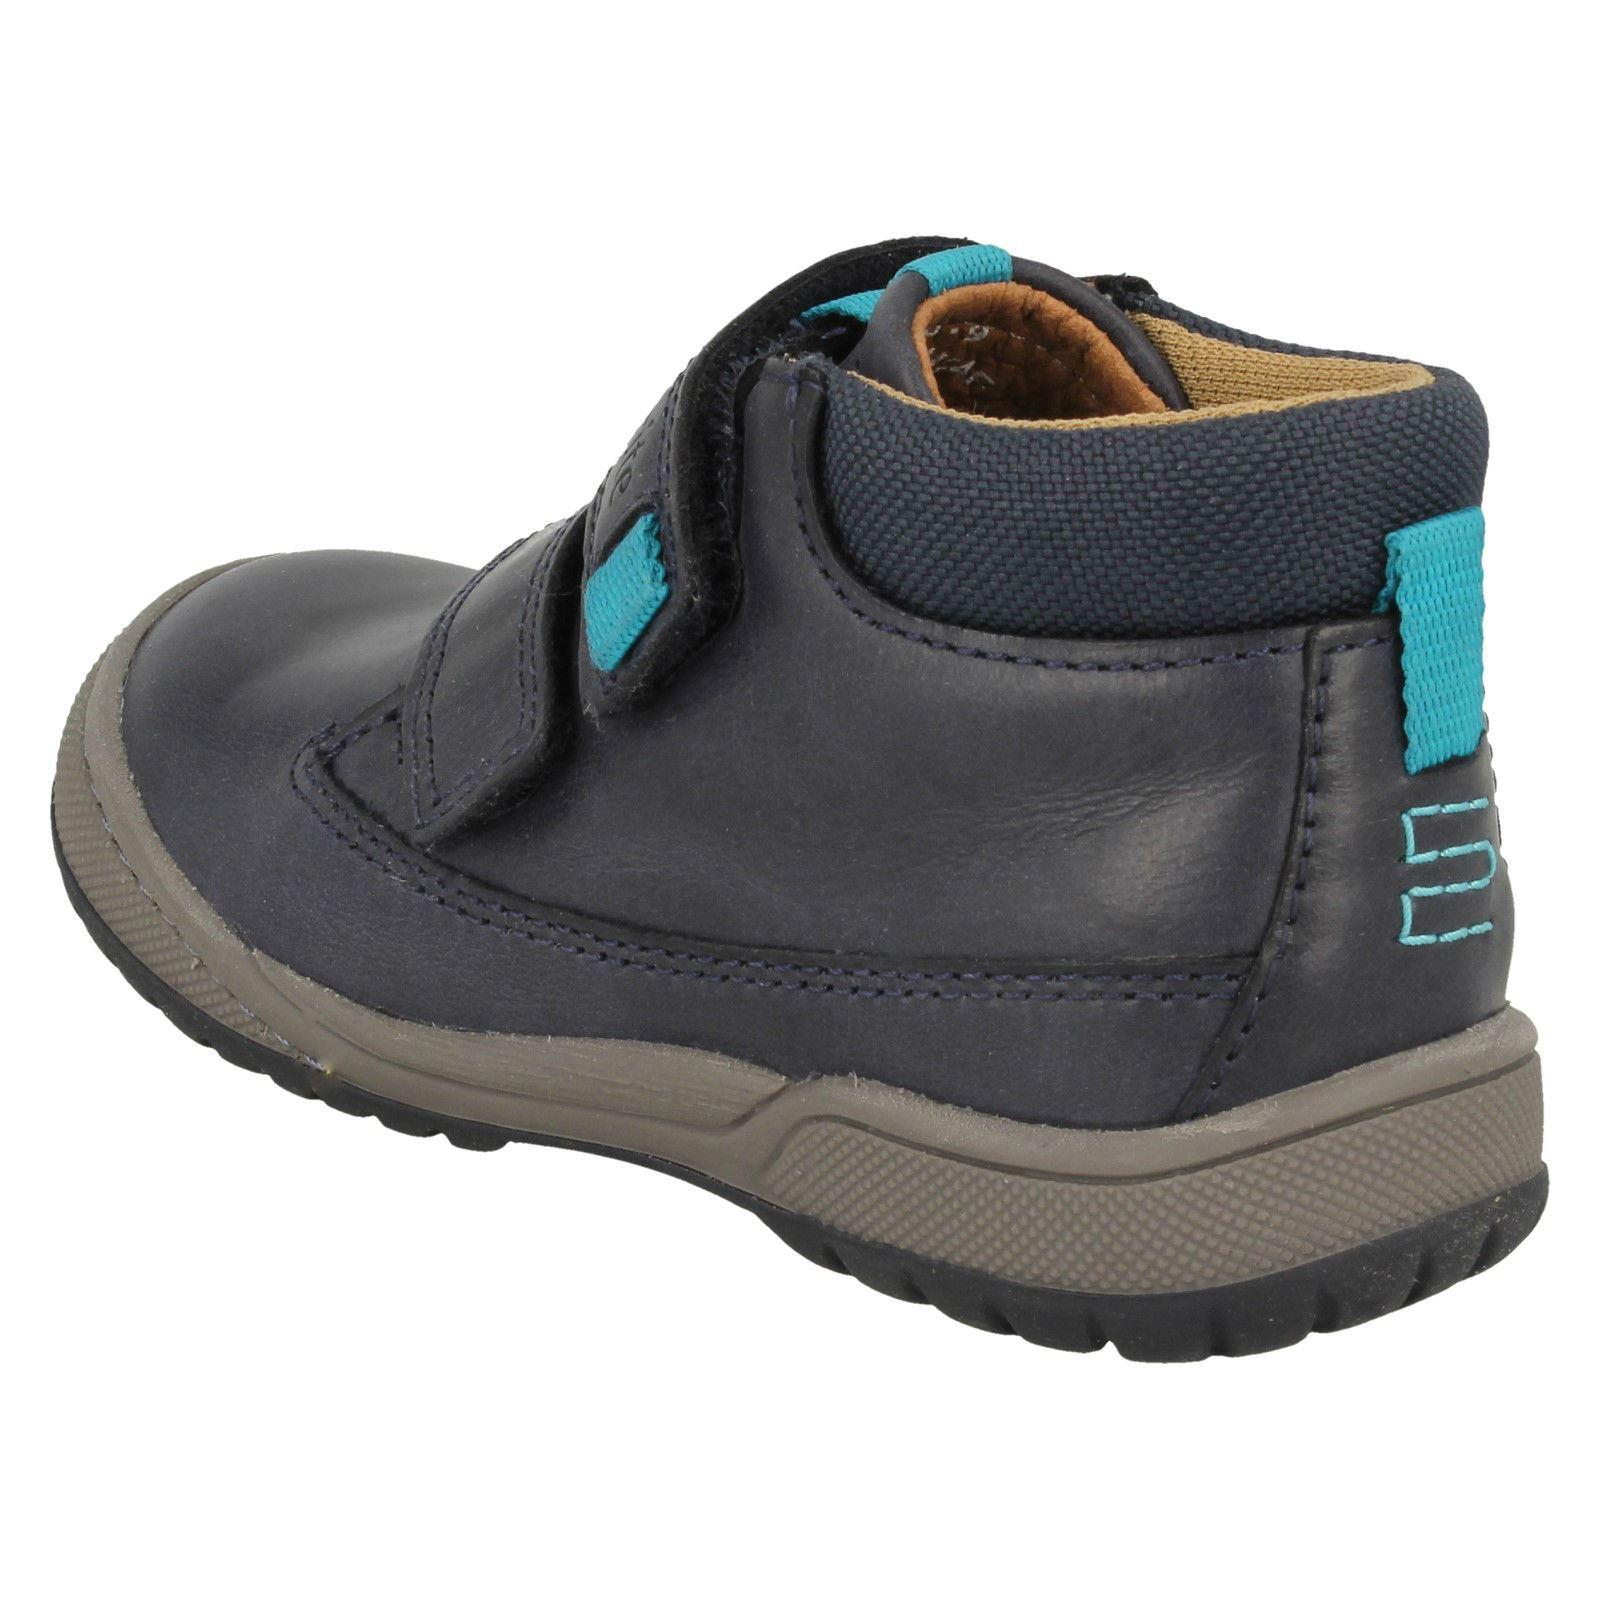 Boys Startrite Casual Boots Flexy Smart Pre